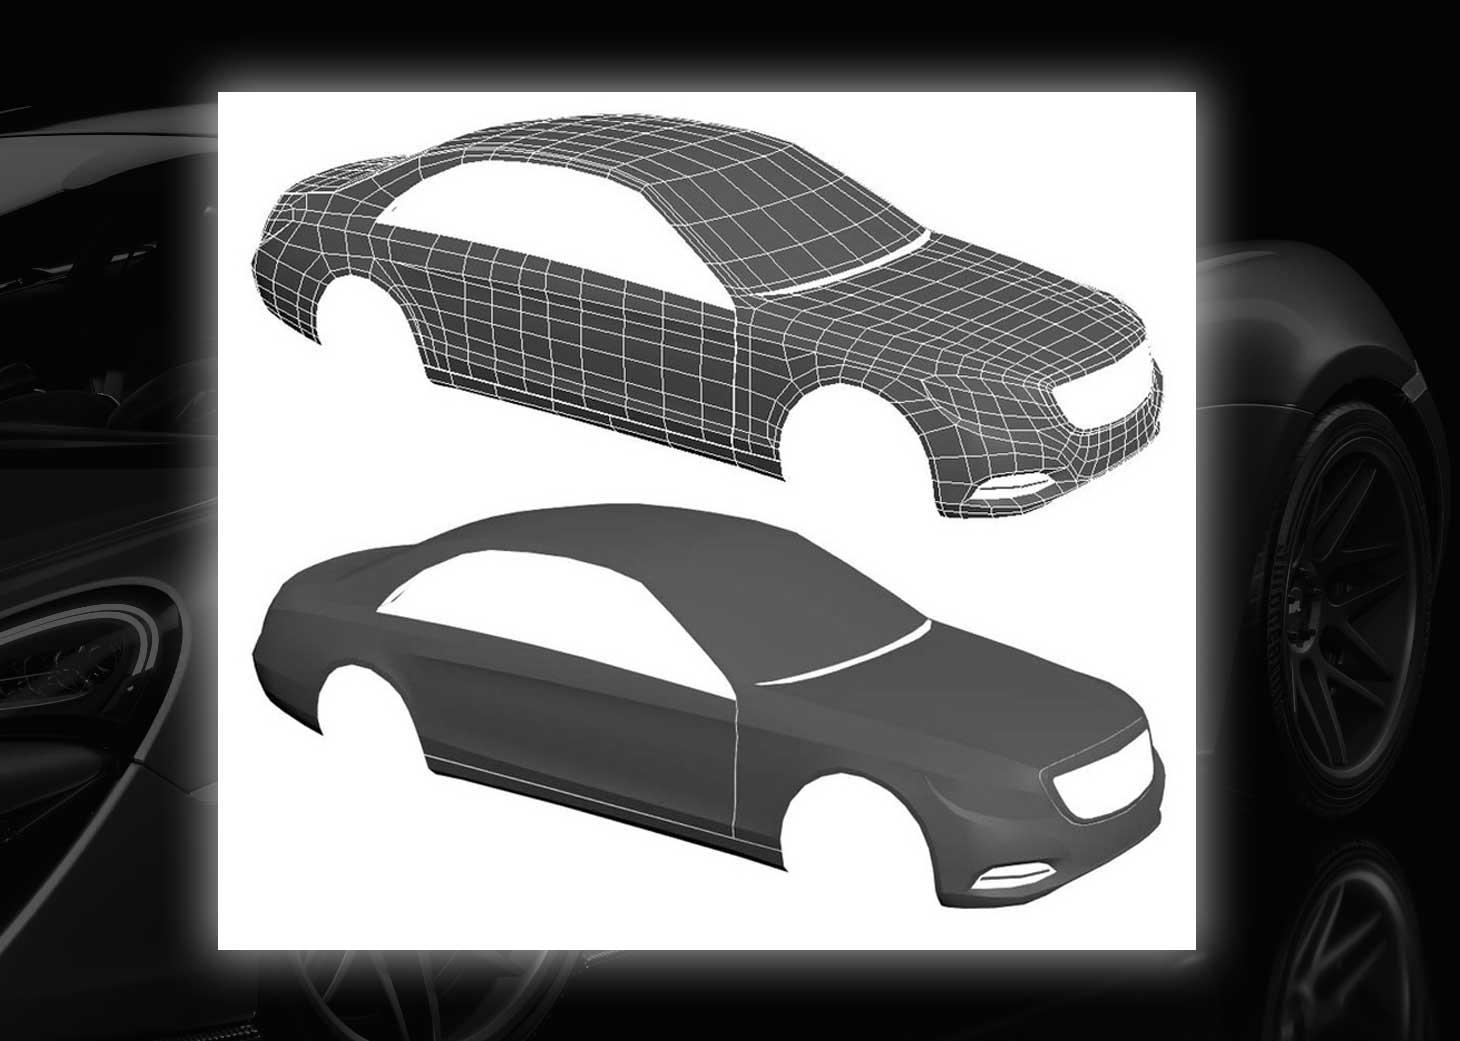 modeling using polygons car 3ds max maya20 - مدلسازی خودرو در تری دی مکس